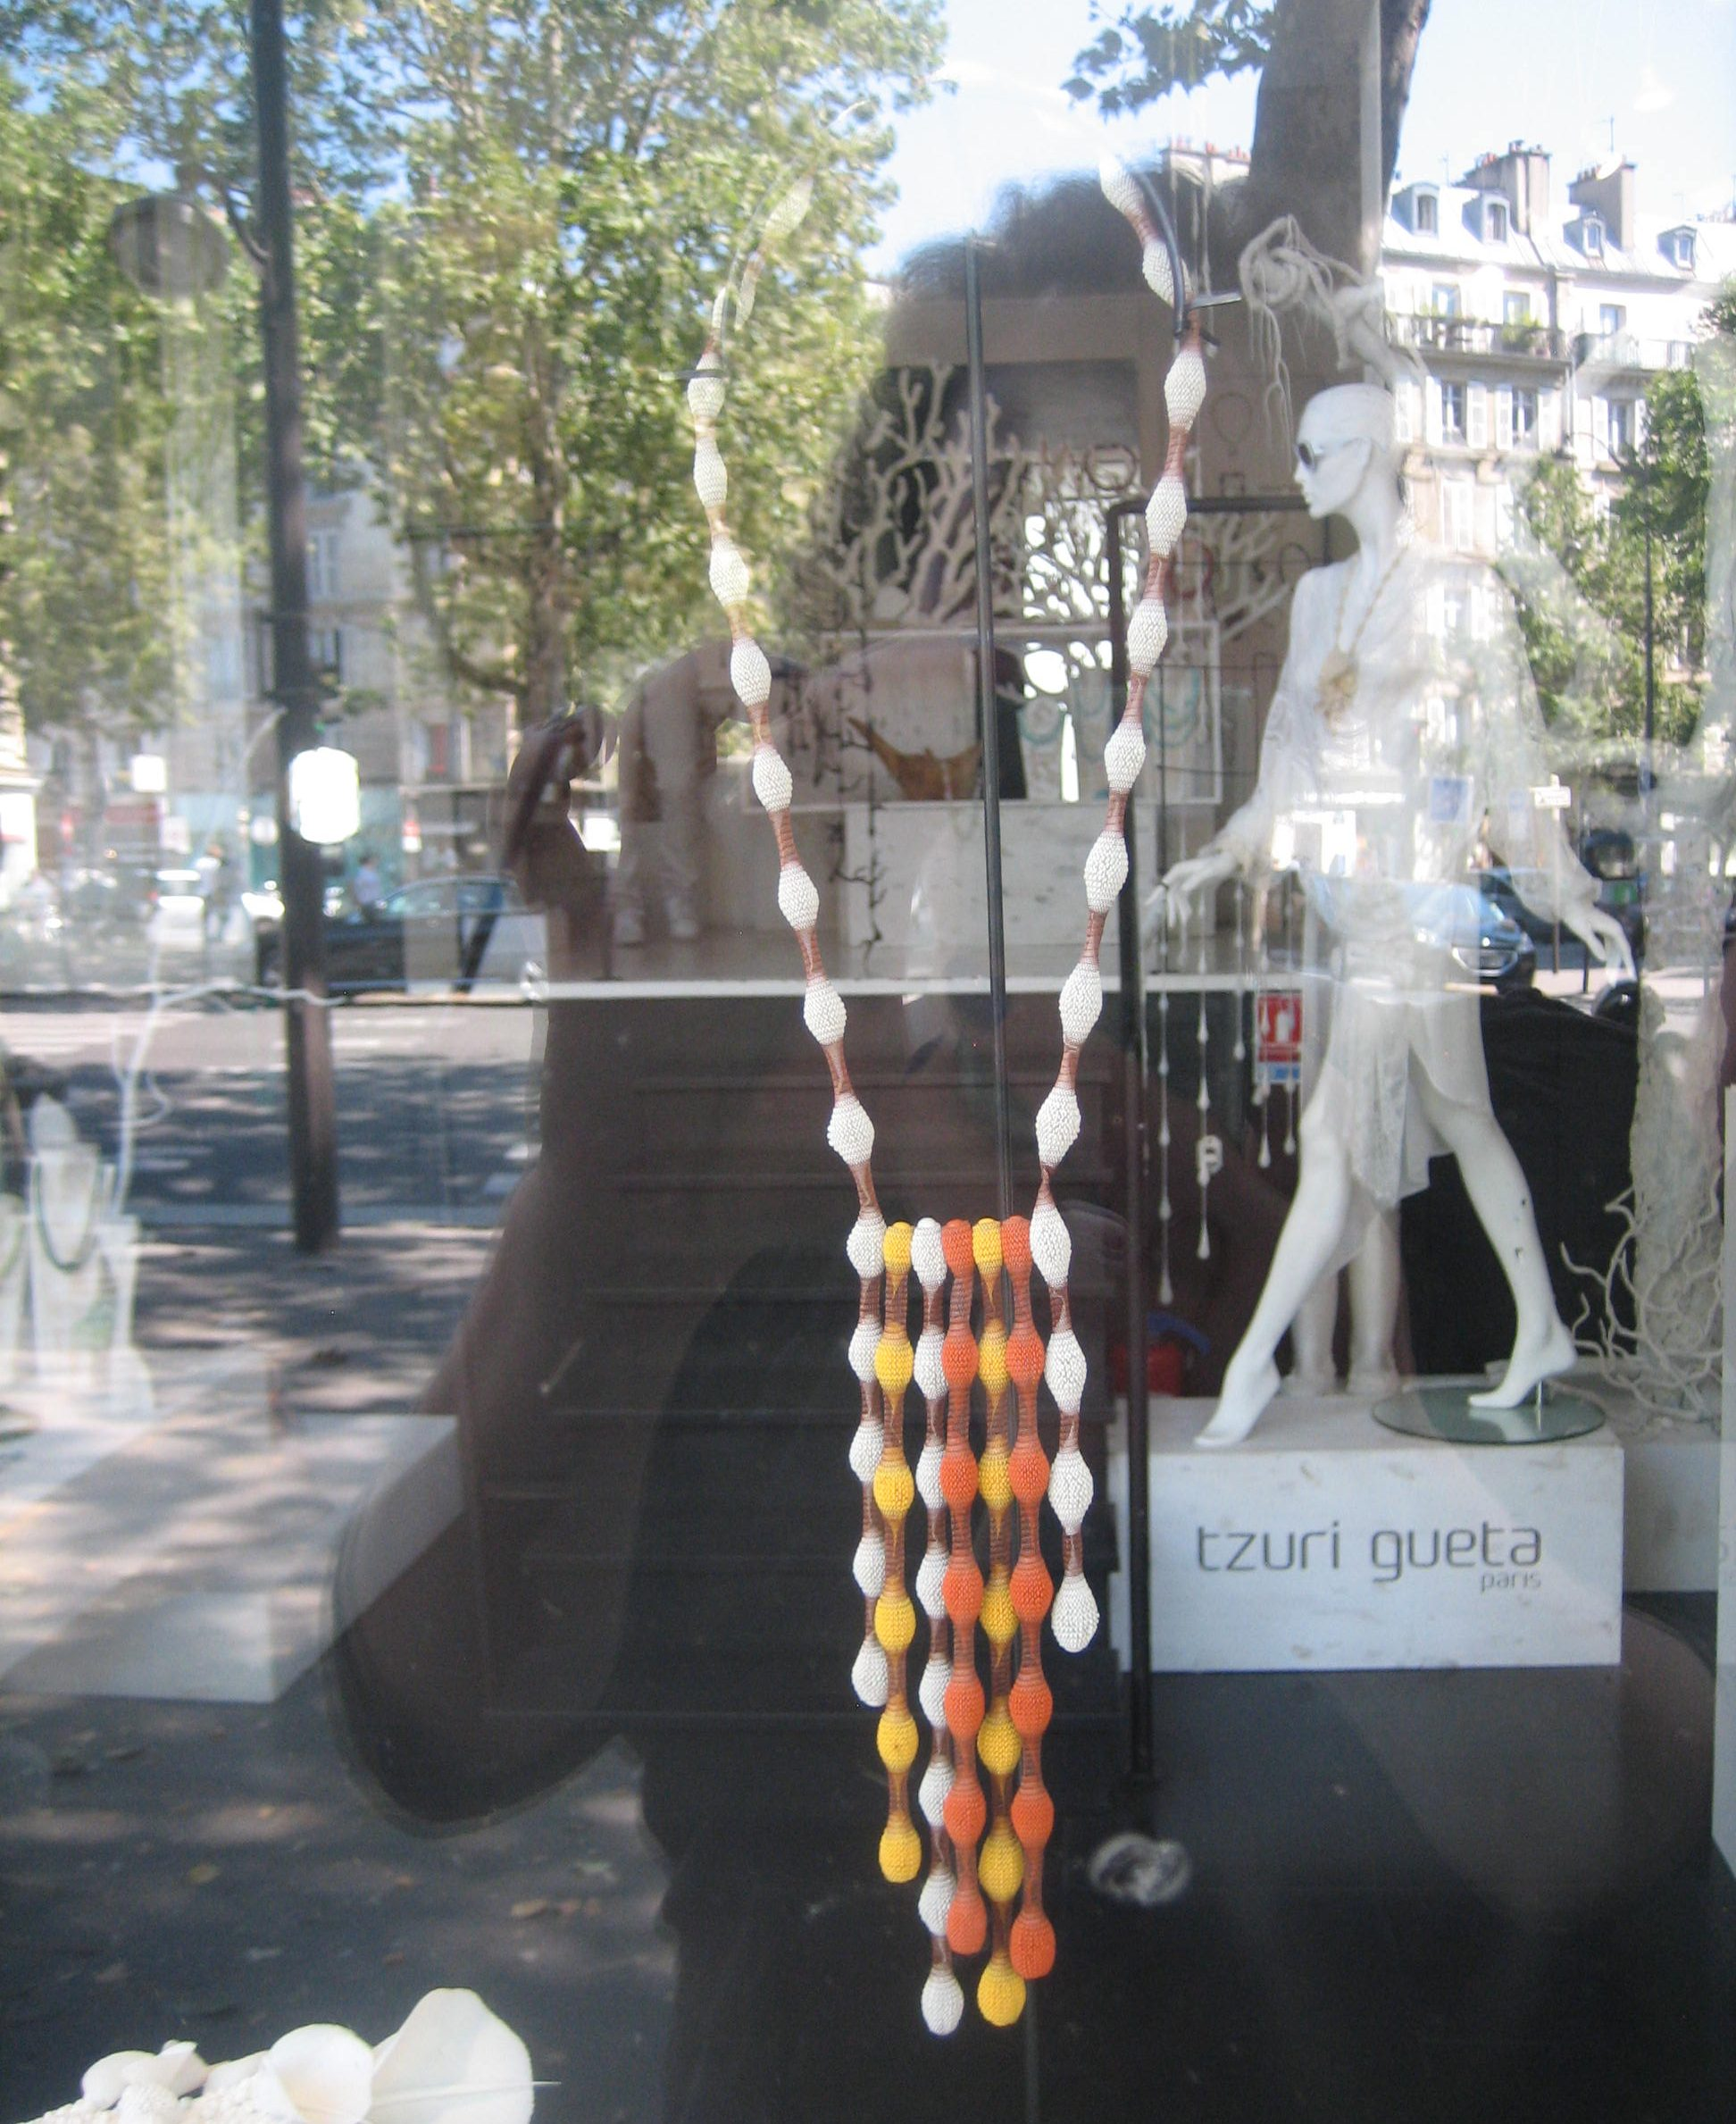 Tzuri Gueta, etalage Rue Dauphine, Parijs, juni 2018. Foto Esther Doornbusch, CC BY 4.0